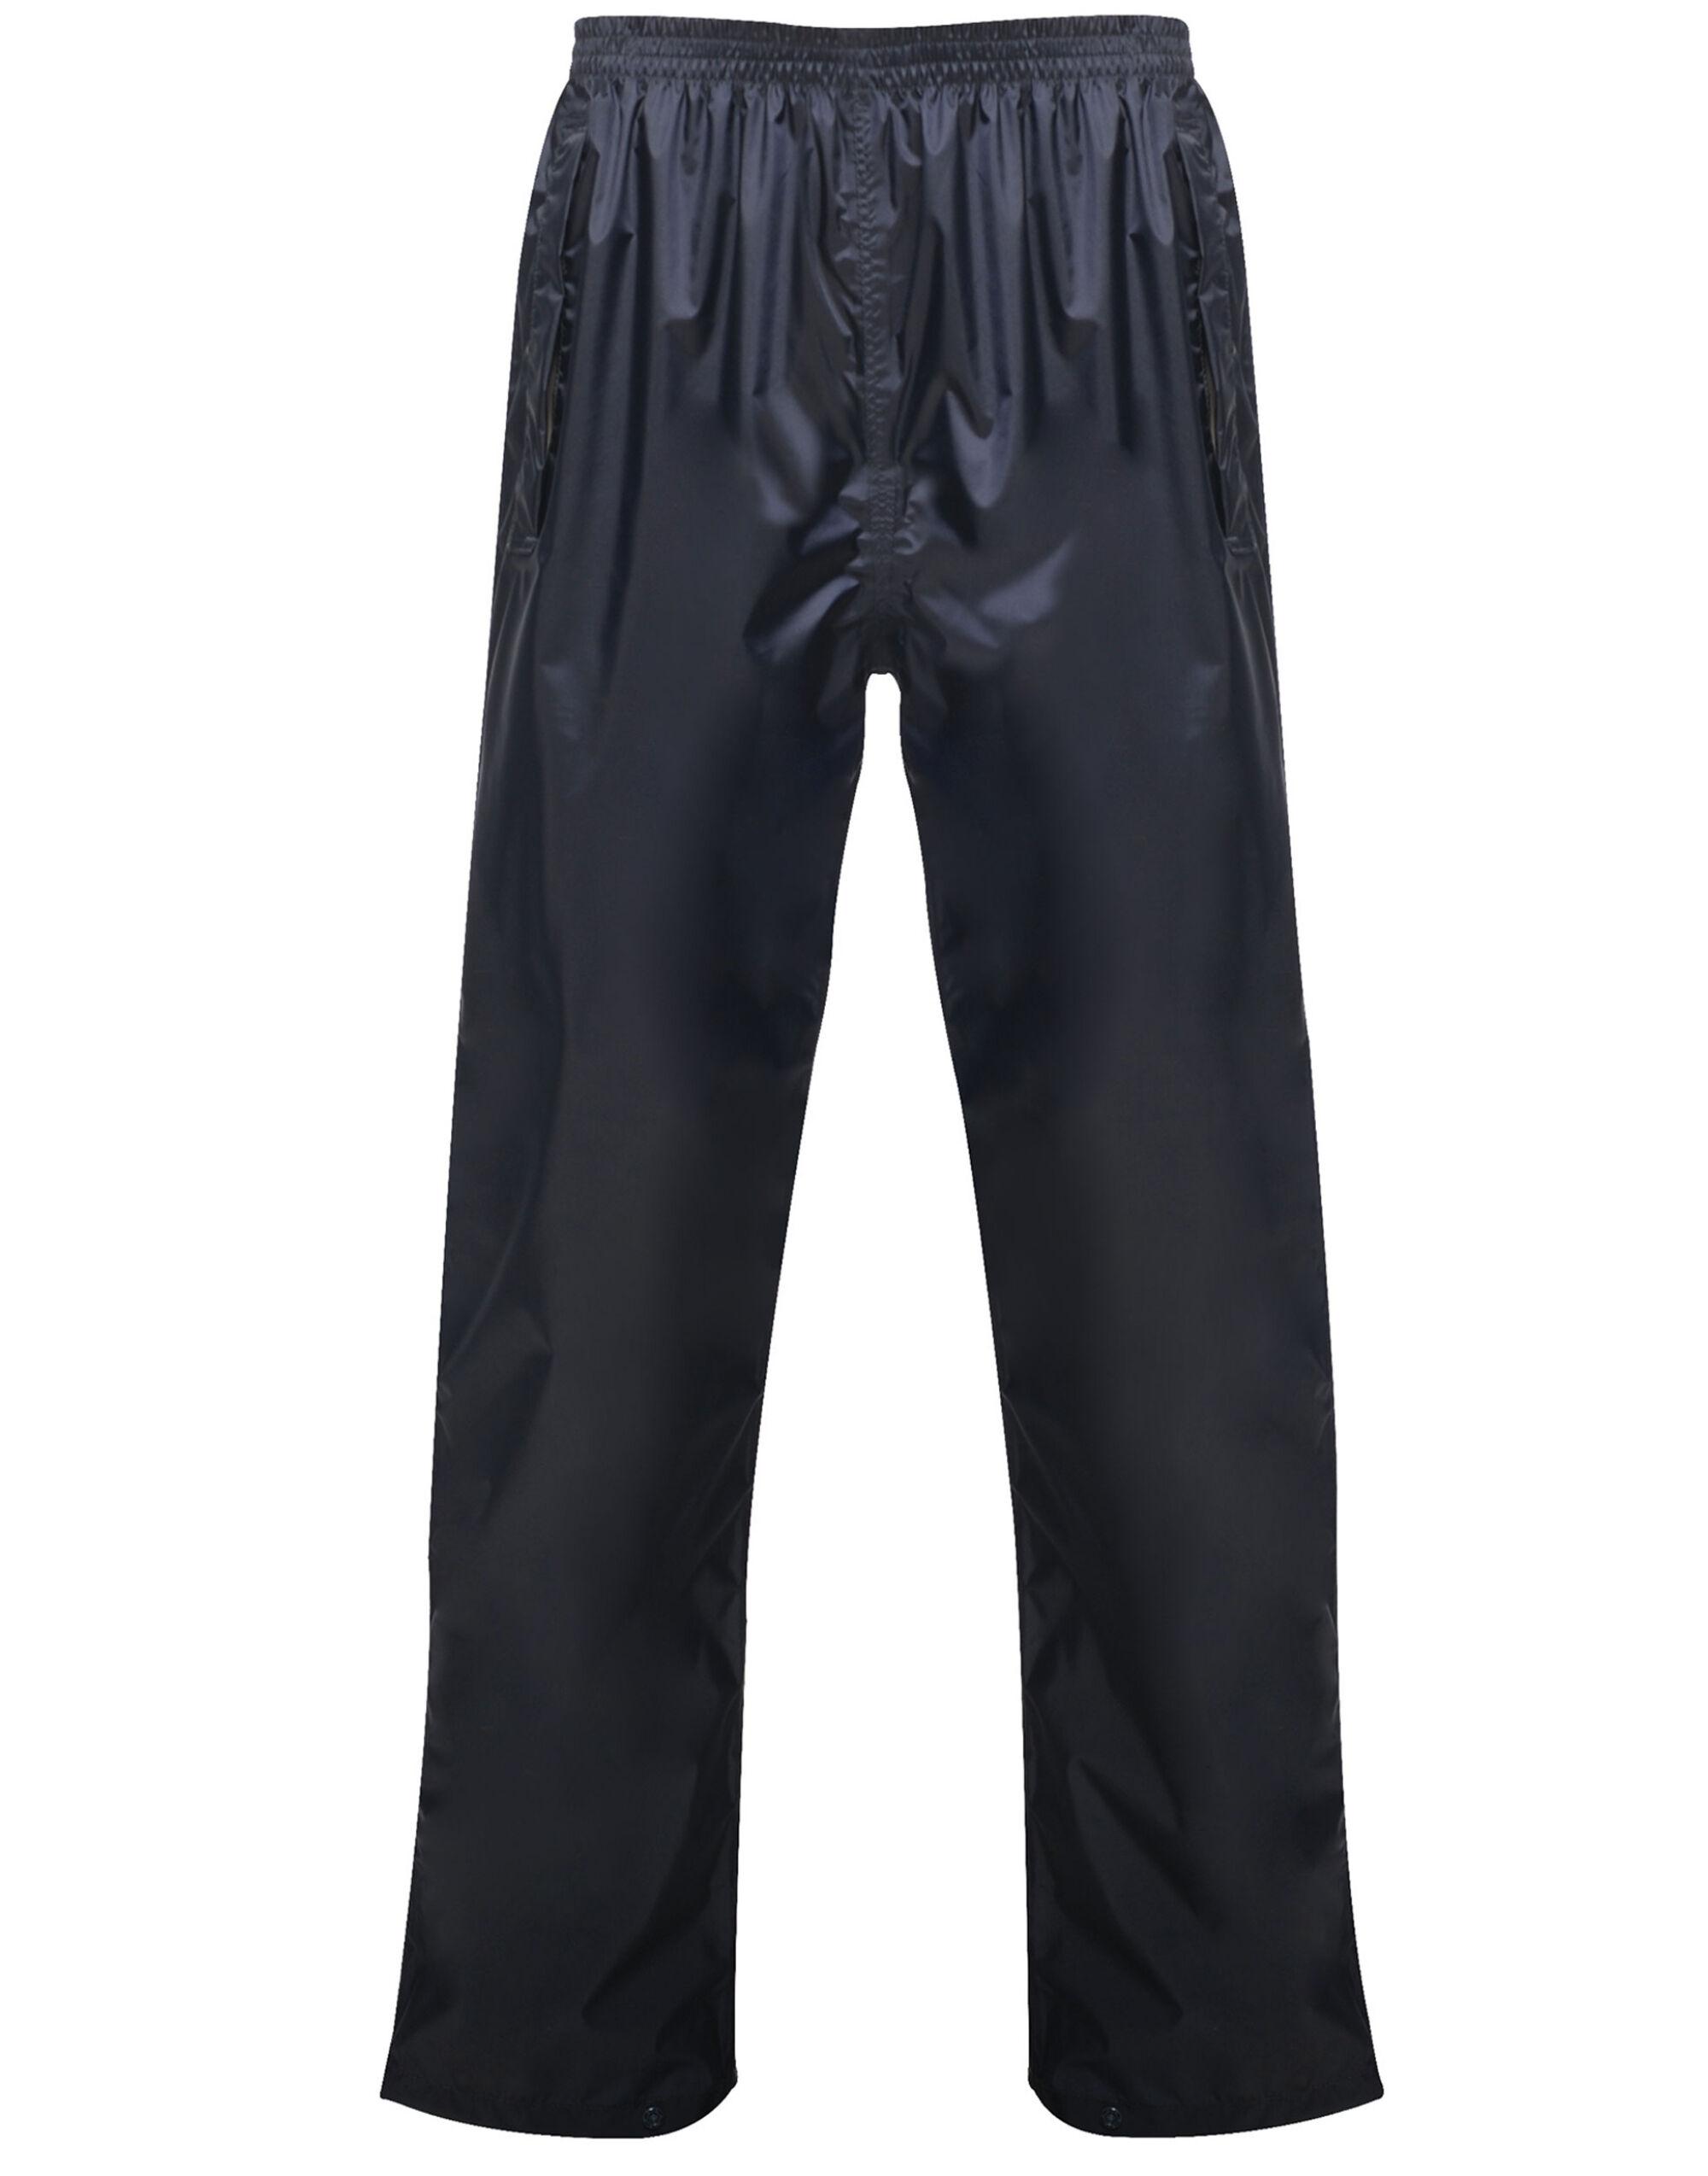 Mens Pro Packaway Trouser